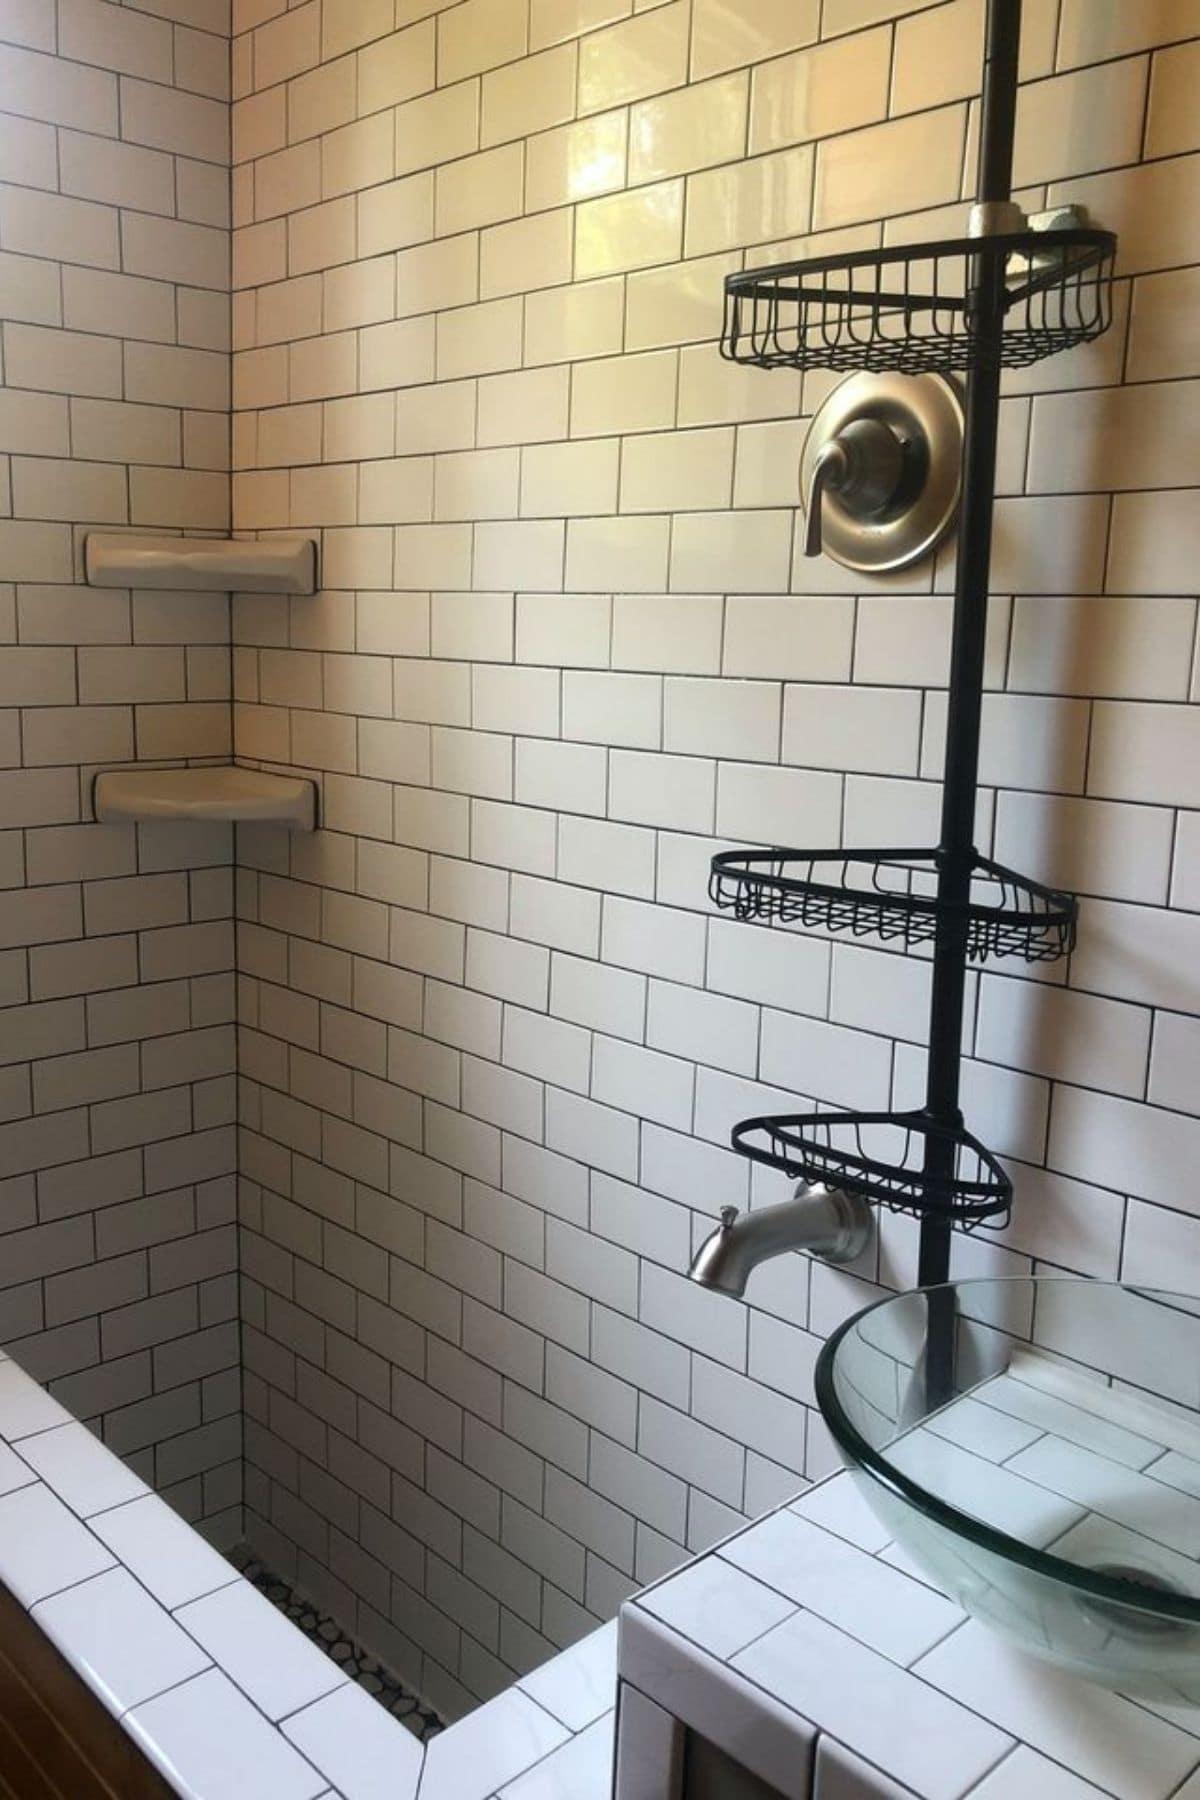 Tiled bathroom shower with wall and black matte hanging basket